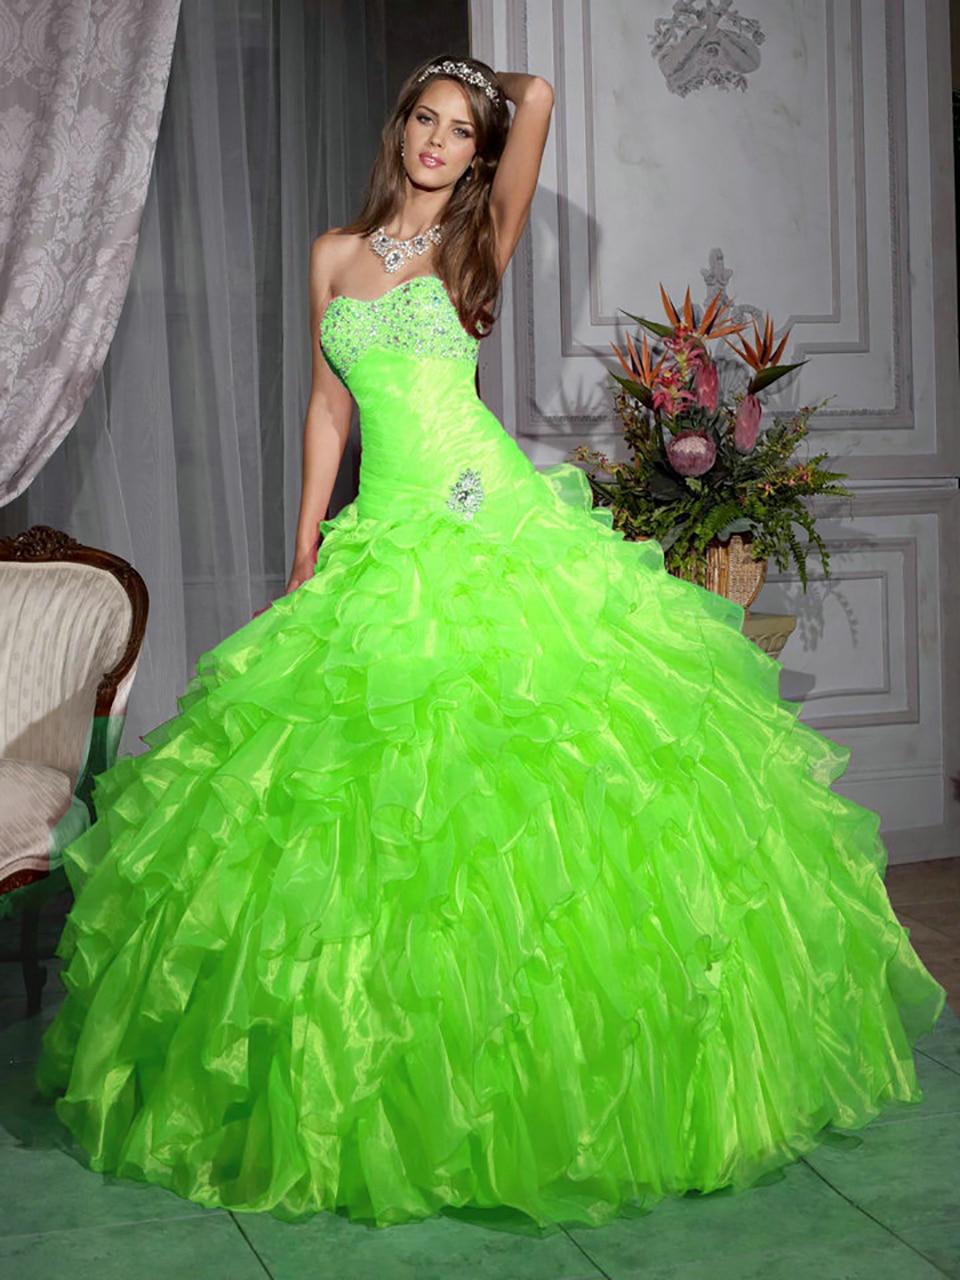 Popular Lime Green Strapless Dress-Buy Cheap Lime Green Strapless ...